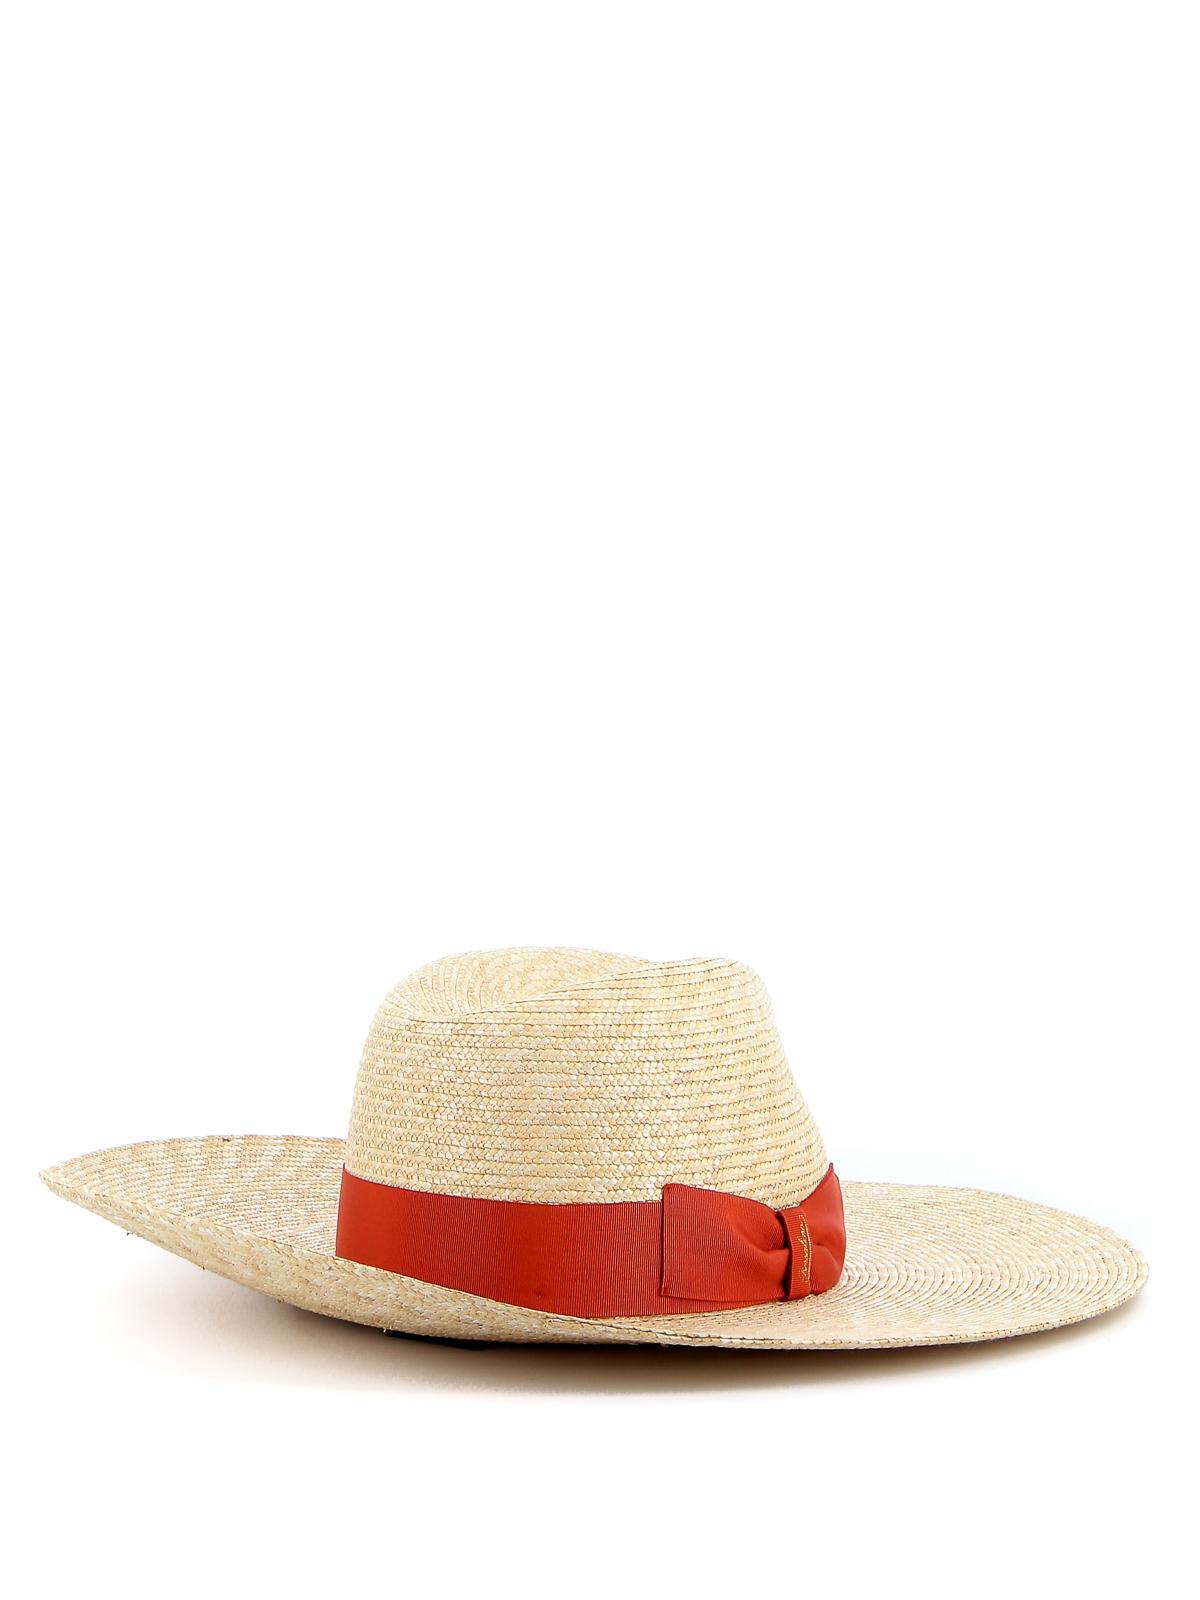 Picture of Borsalino | Panama Hat